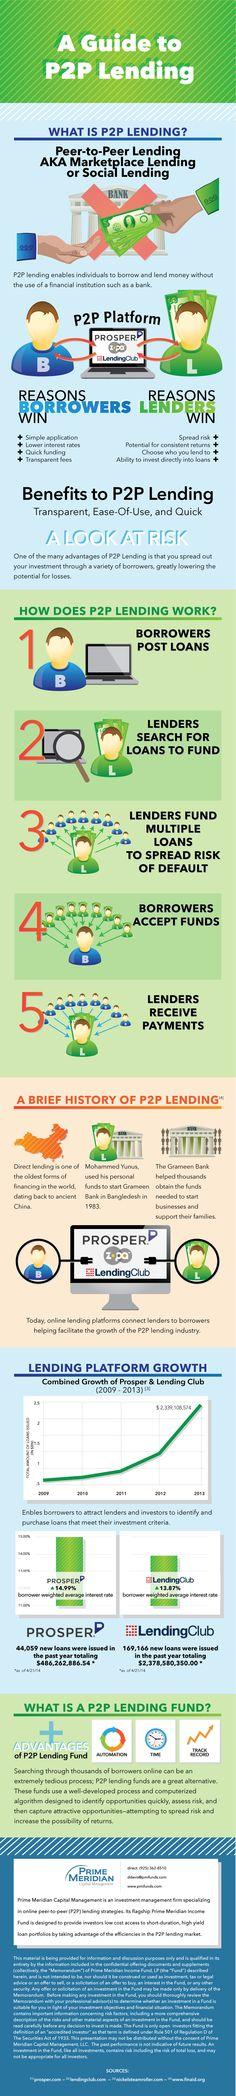 PMI Peer to peer lending infographic